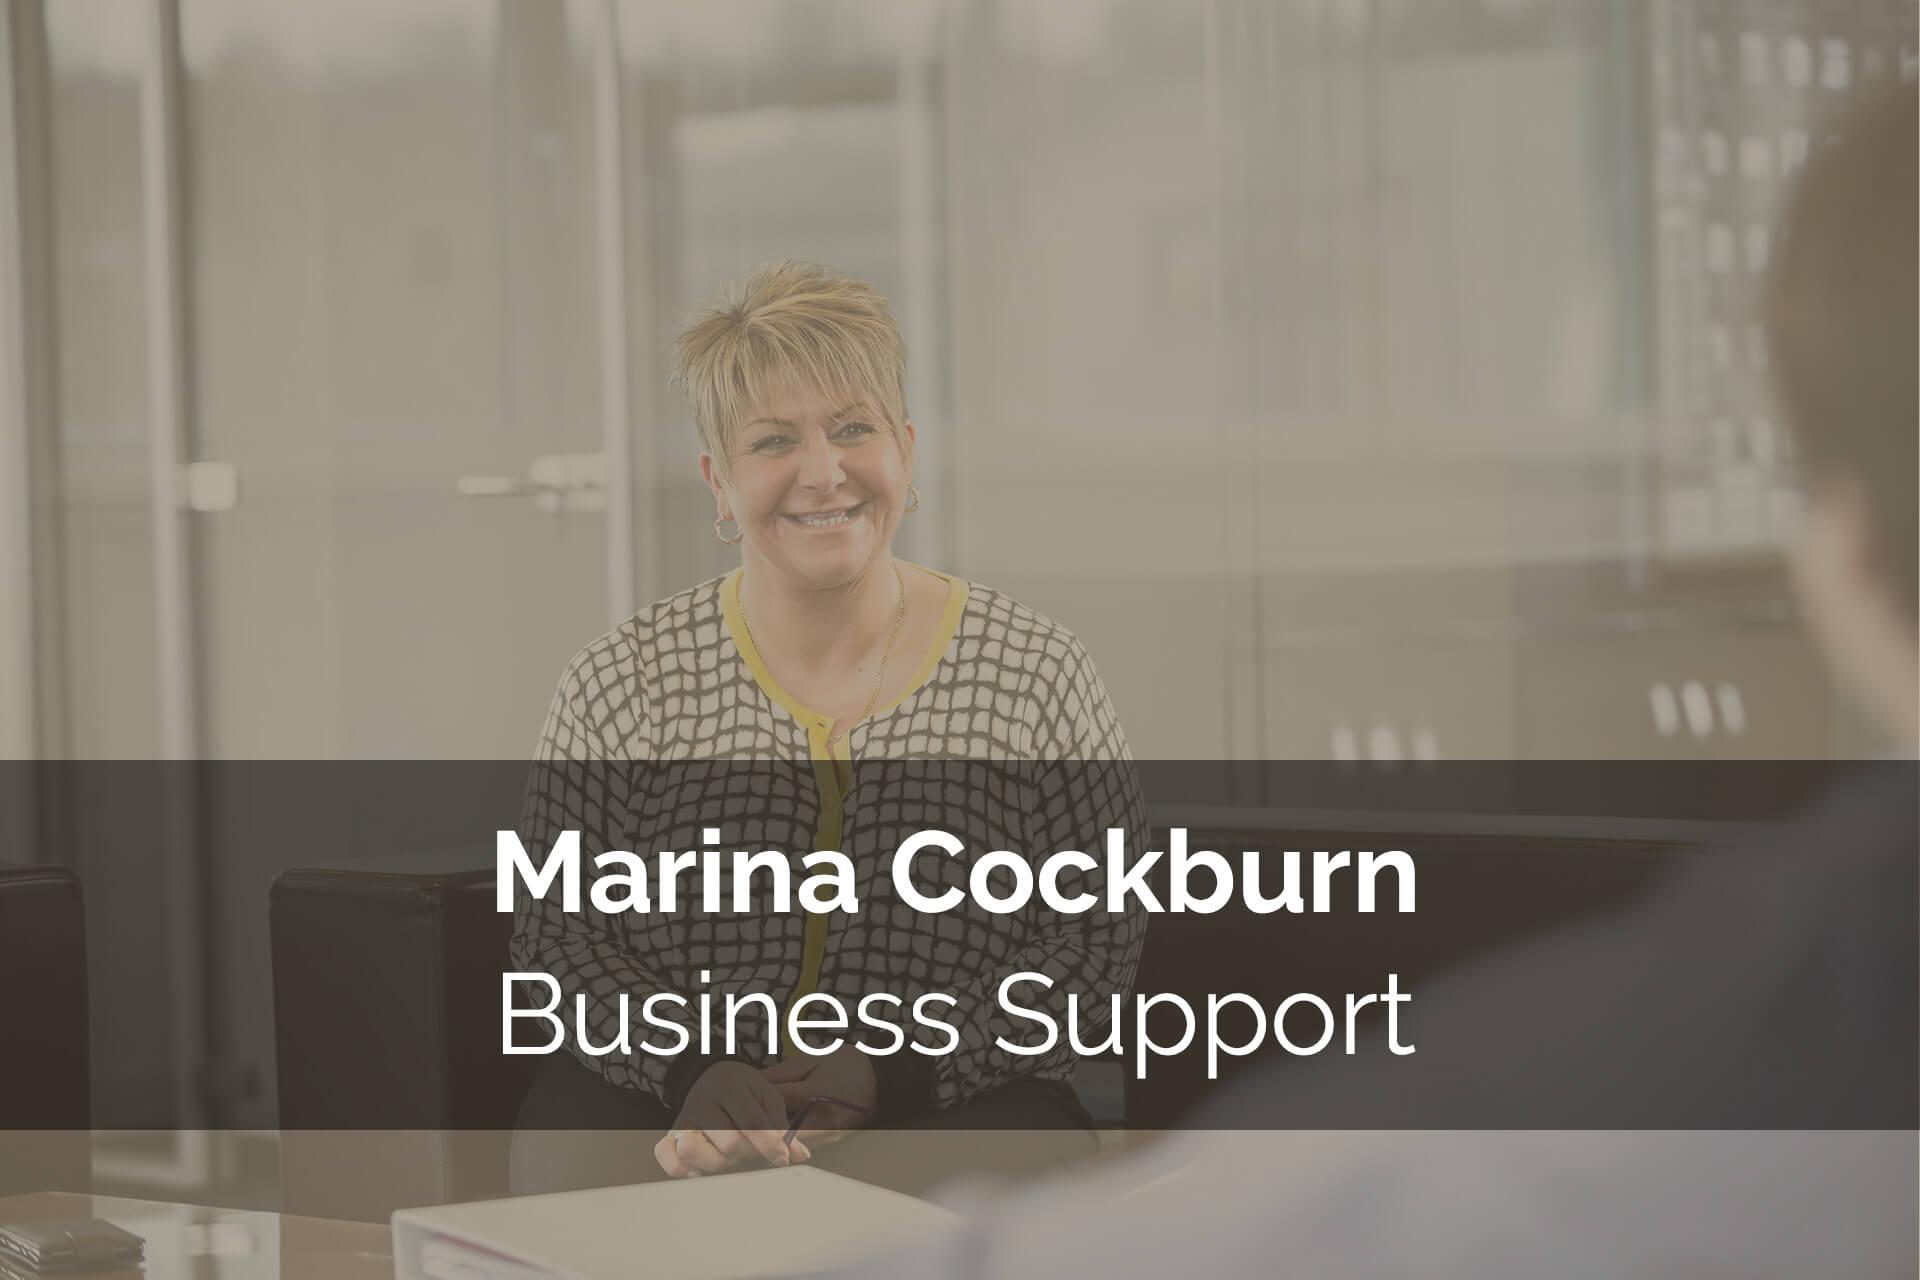 Marina Cockburn